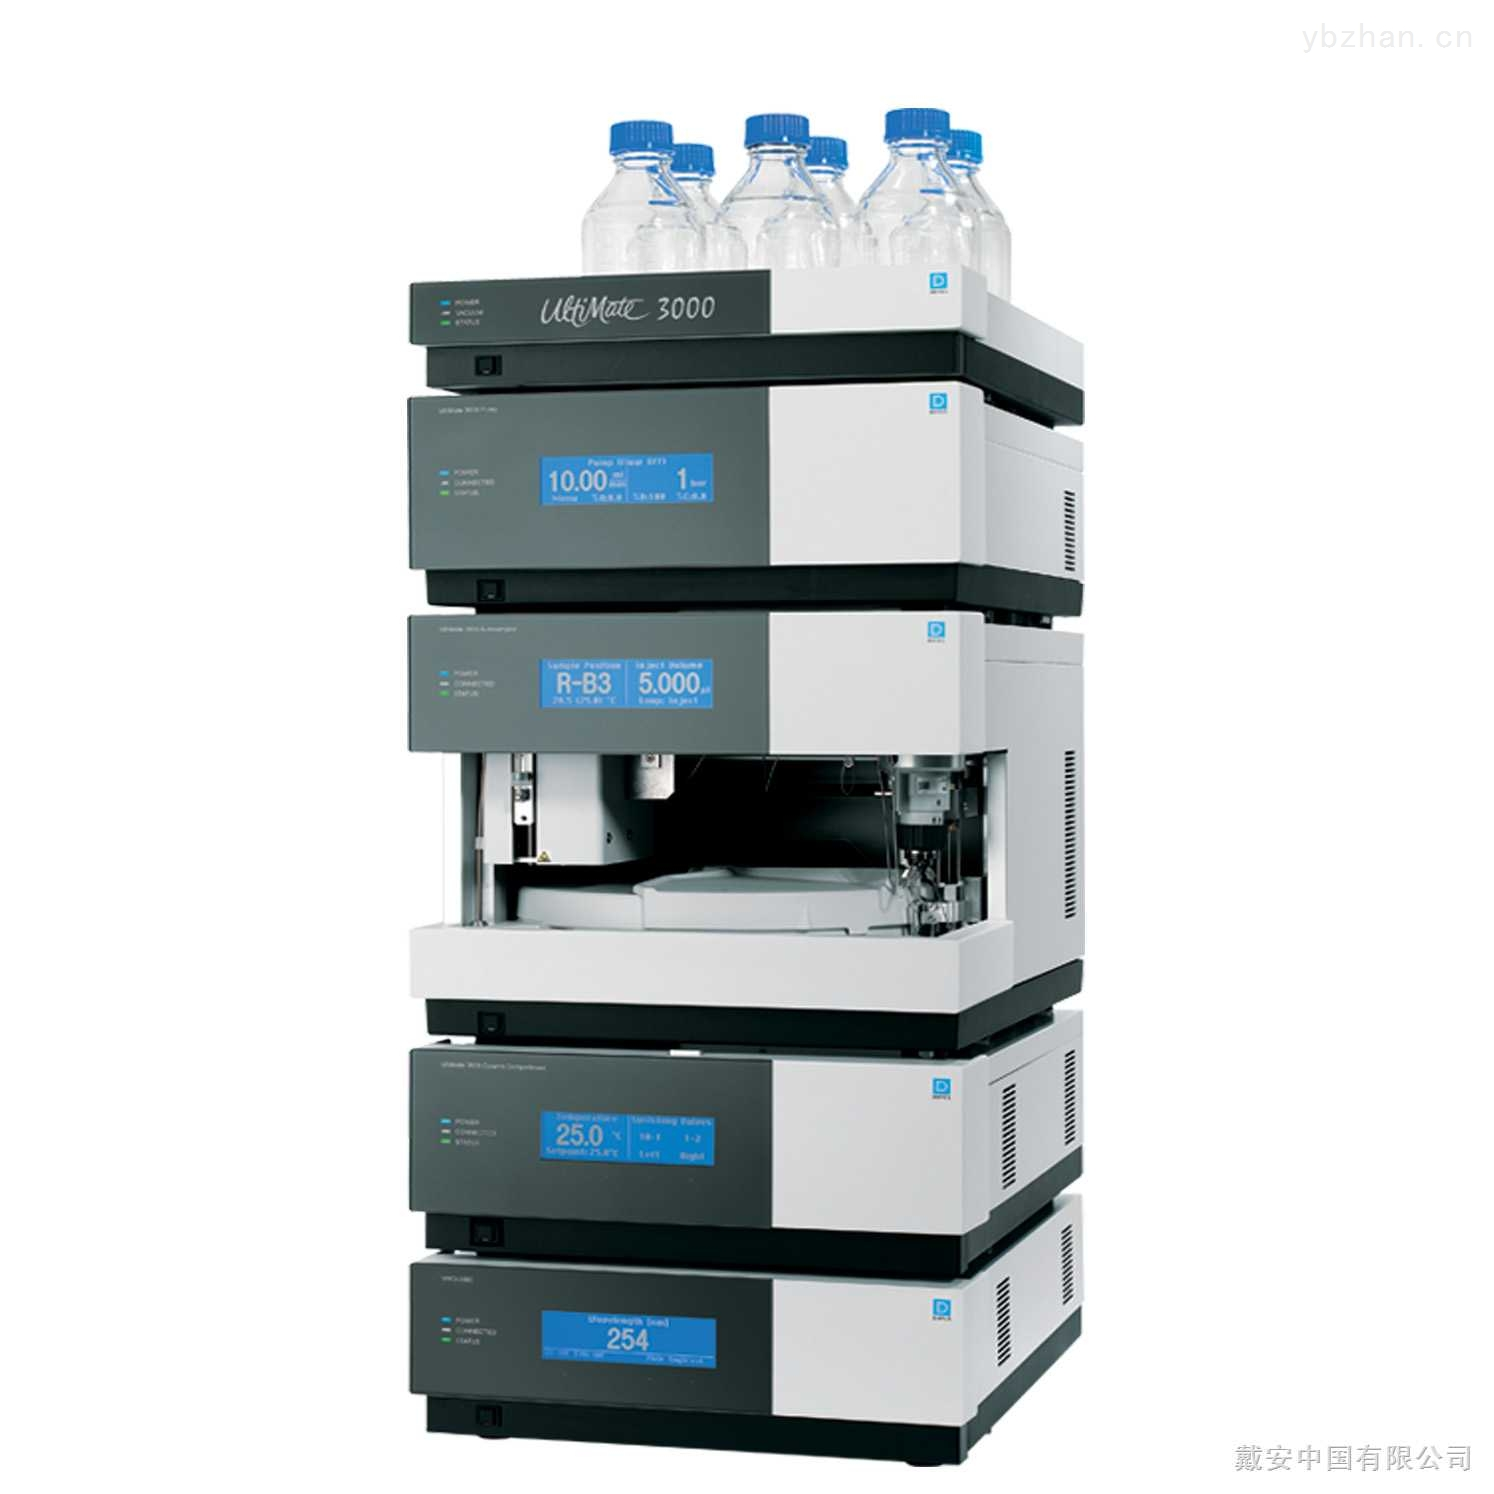 UltiMate3000 戴安高效液相色谱仪